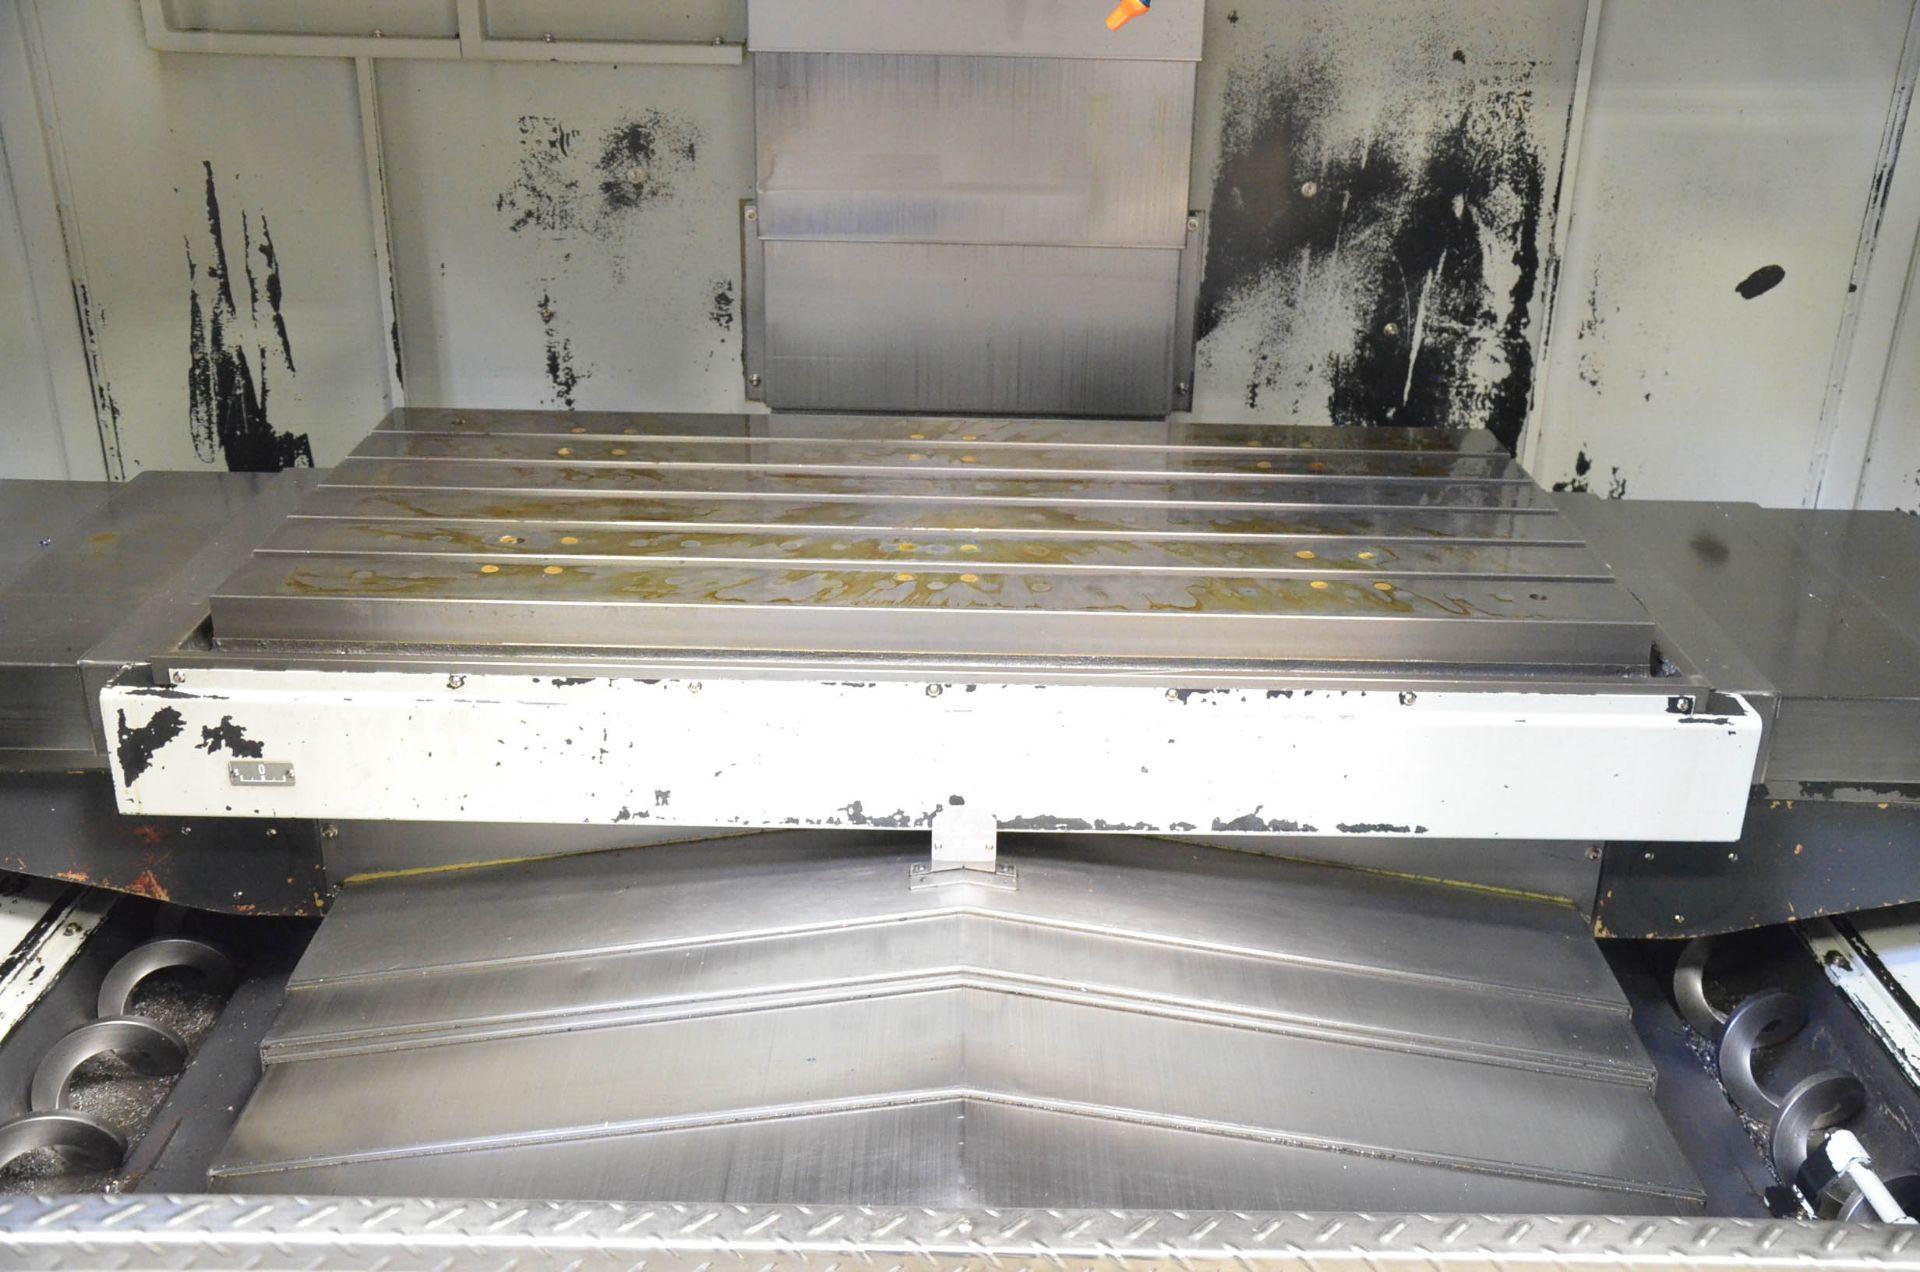 AWEA YAMA SEIKI (2012) AF-1250 CNC VERTICAL MACHINING CENTER WITH FANUC SERIES 31I-MODEL B CNC - Image 3 of 10